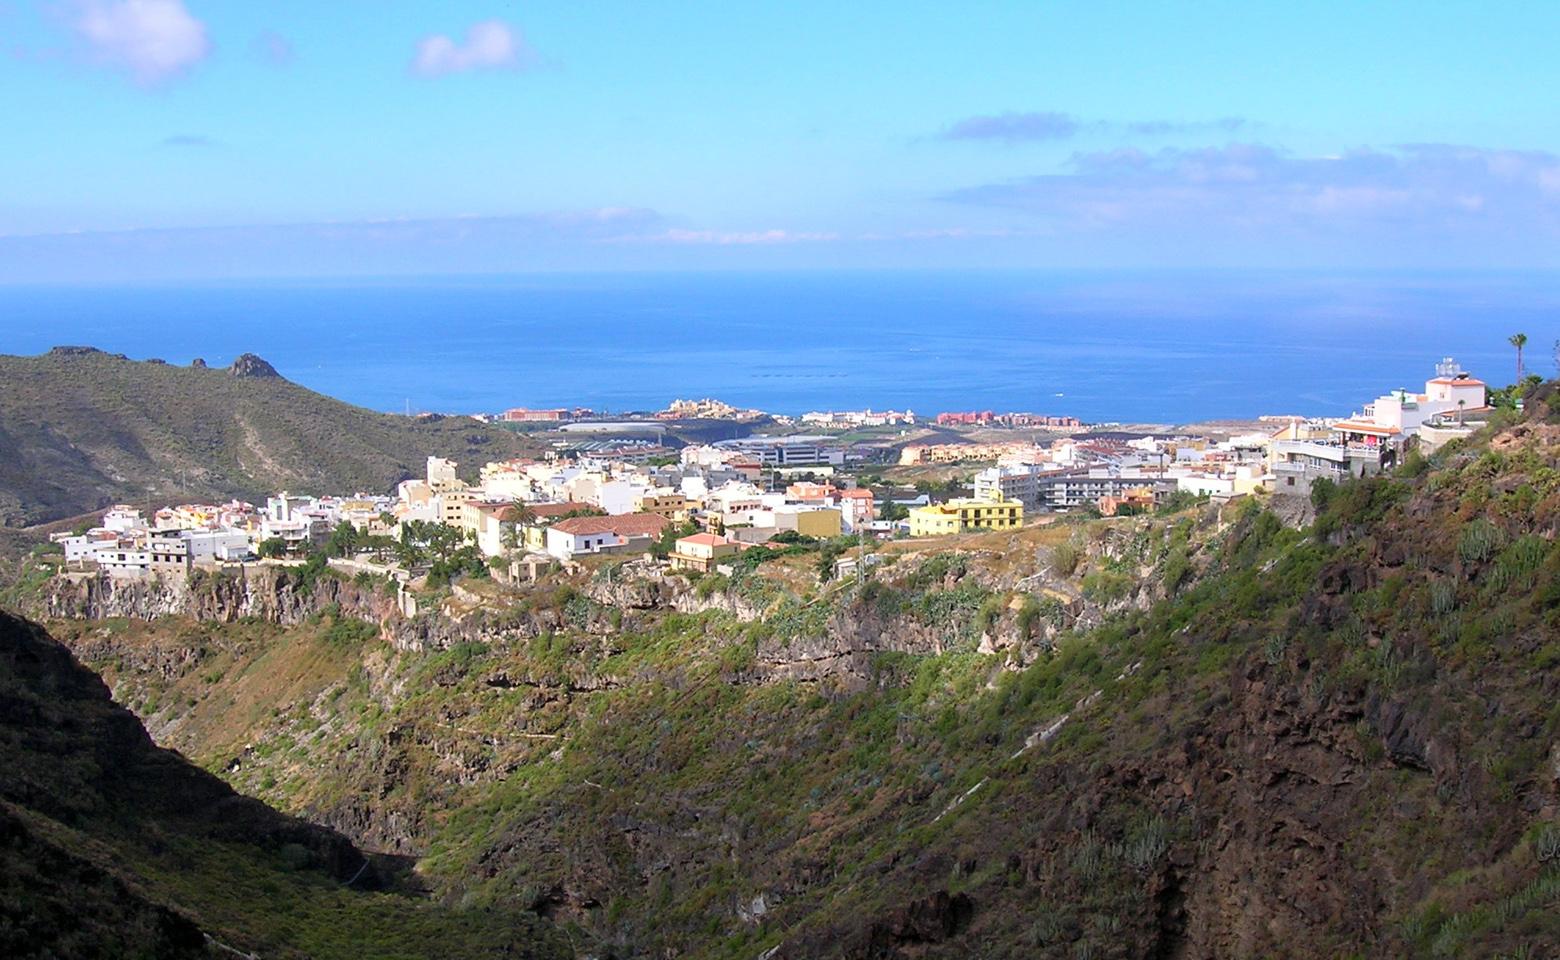 Grande Hotel Costa Adeje Tenerife